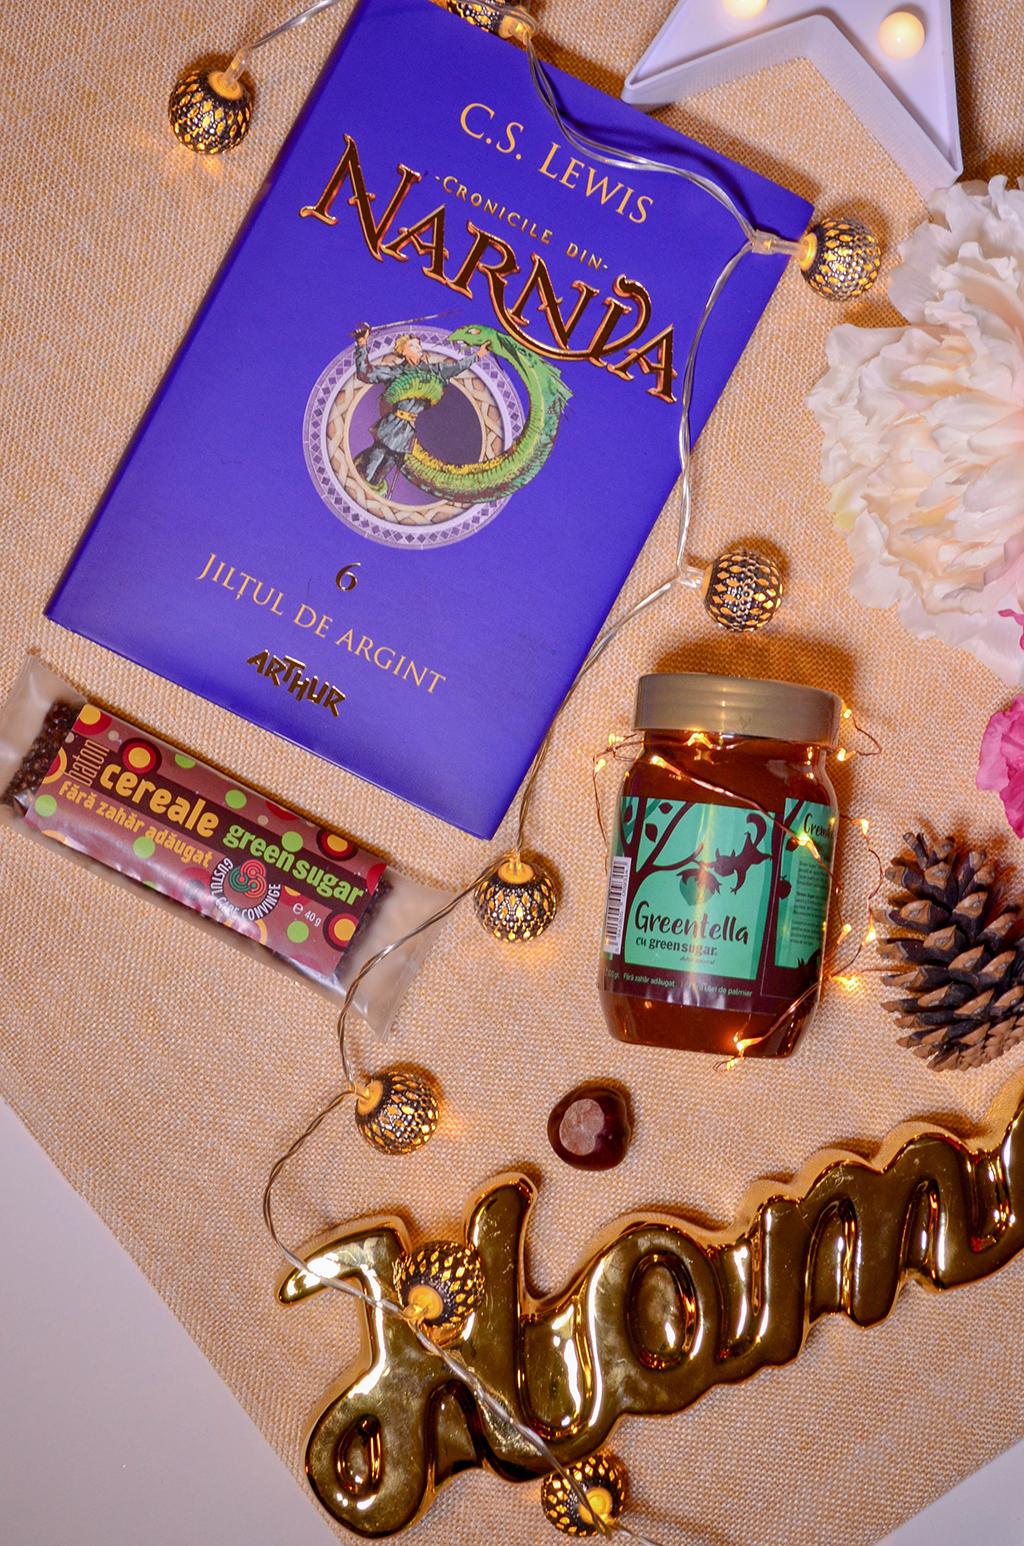 review grentella green sugar crema cacao zero zahar